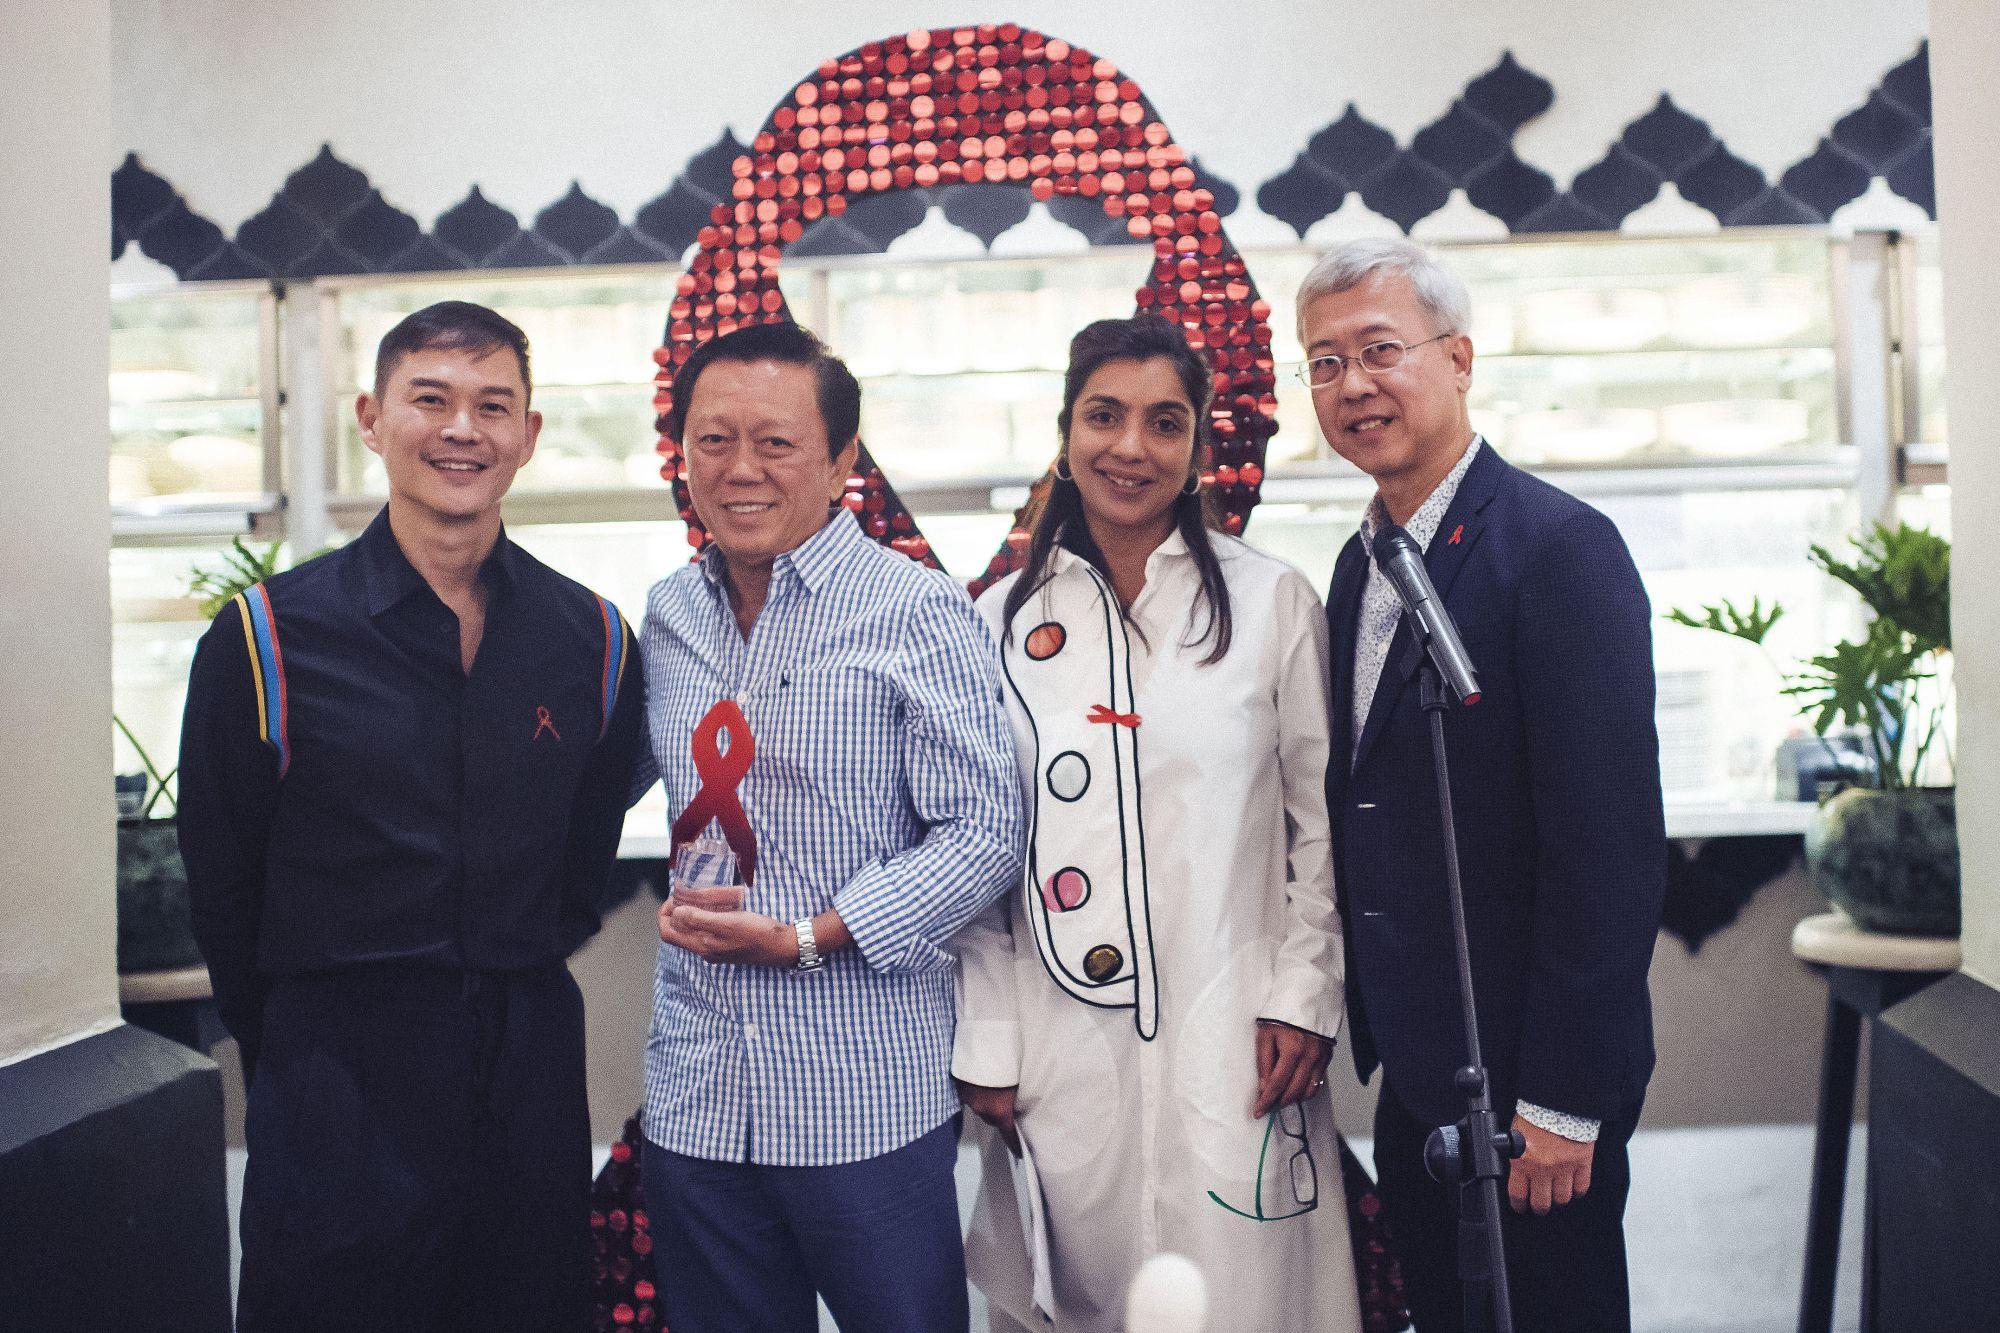 Roy Chan, Patrick Chong, Priya Sen, Saxone Woon